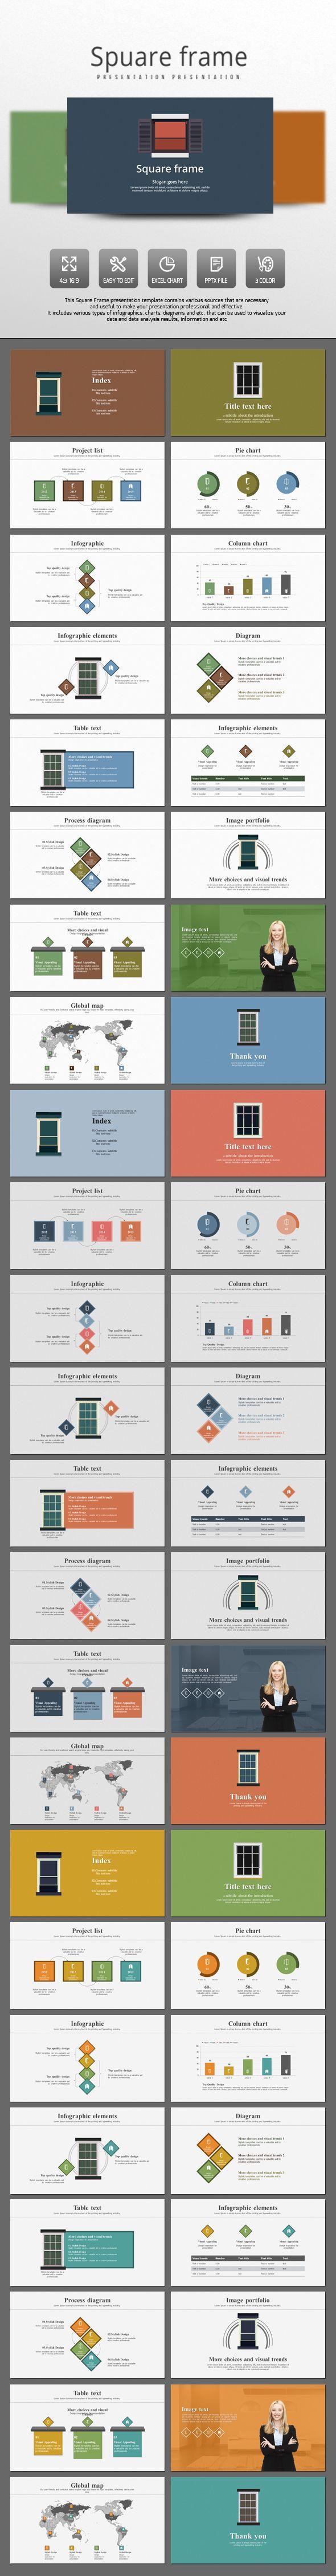 Frame PowerPoint Presentation Template #design #slides Download: http://graphicriver.net/item/frame/13127287?ref=ksioks